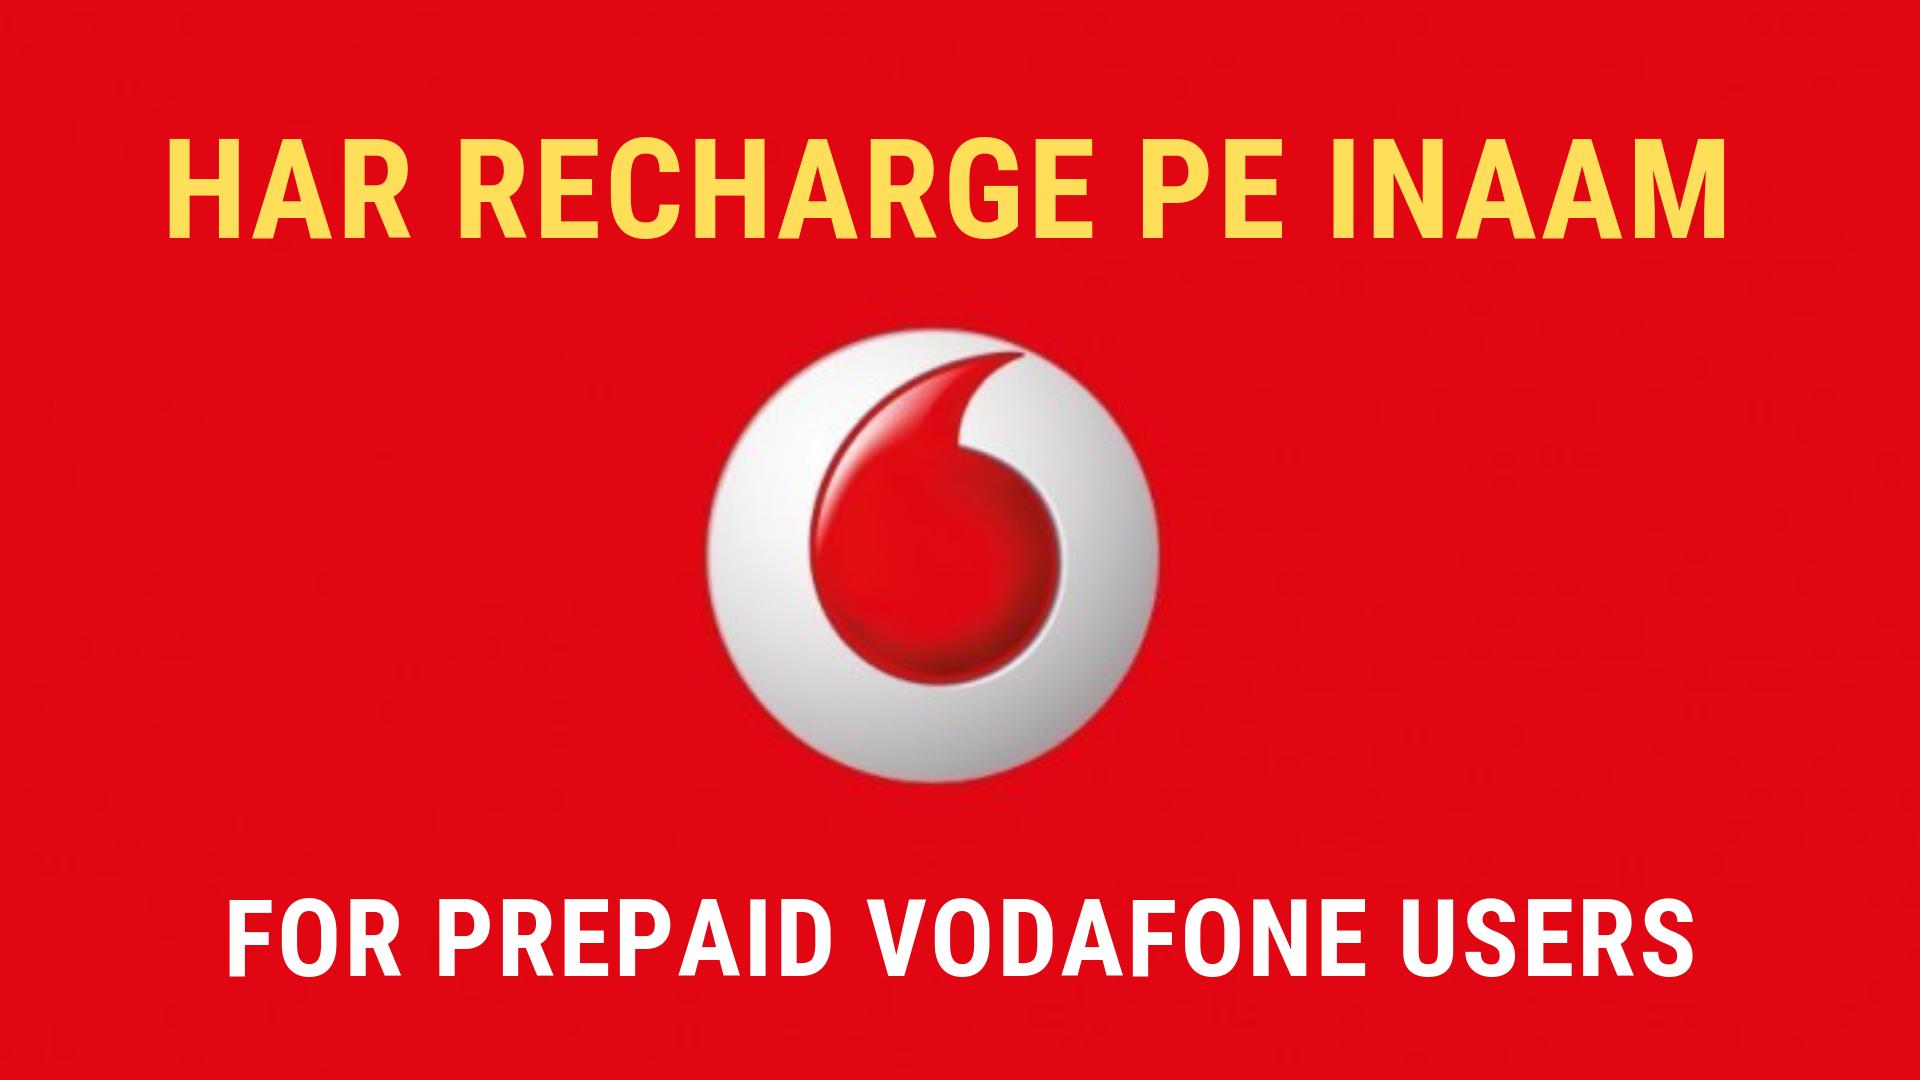 Vodafone Reward Program